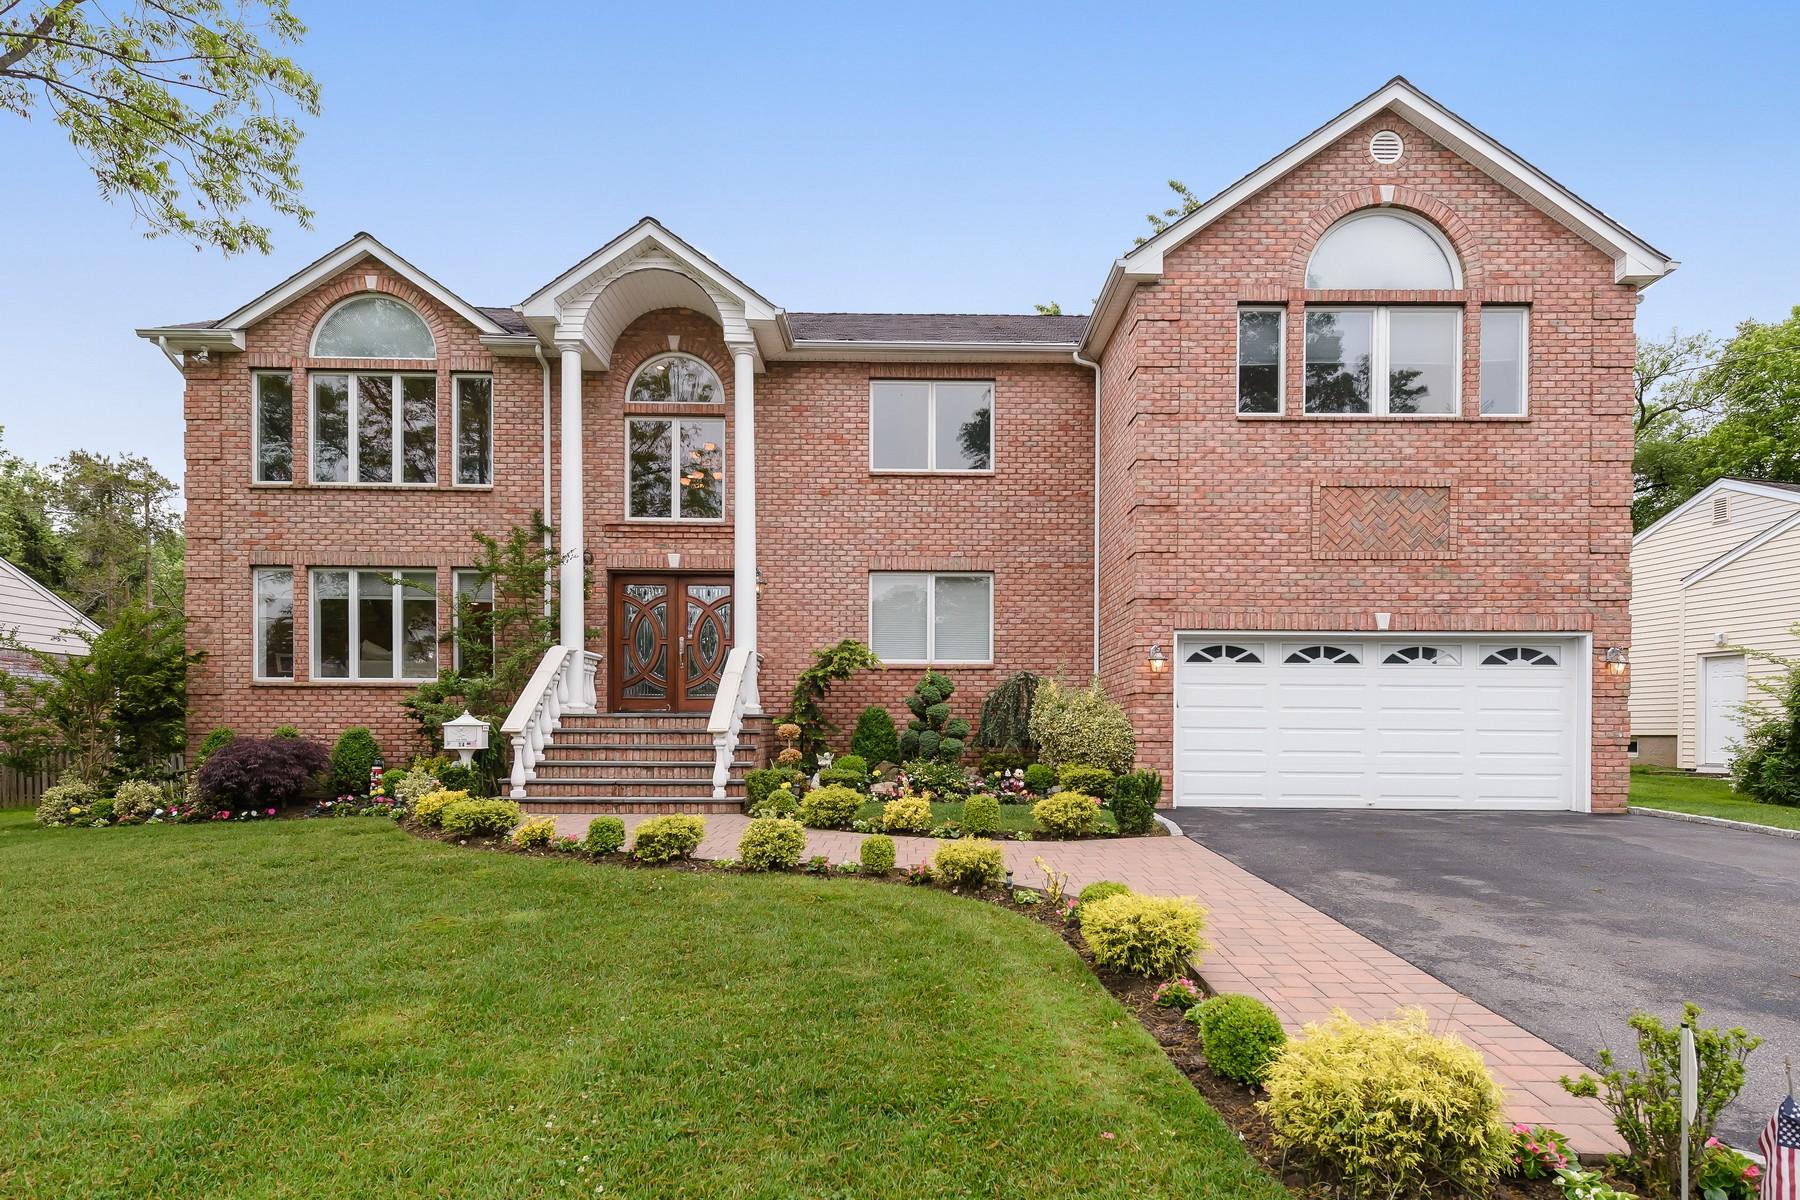 Single Family Home for Sale at 14 Capri Dr 14 Capri Dr Roslyn, New York, 11576 United States